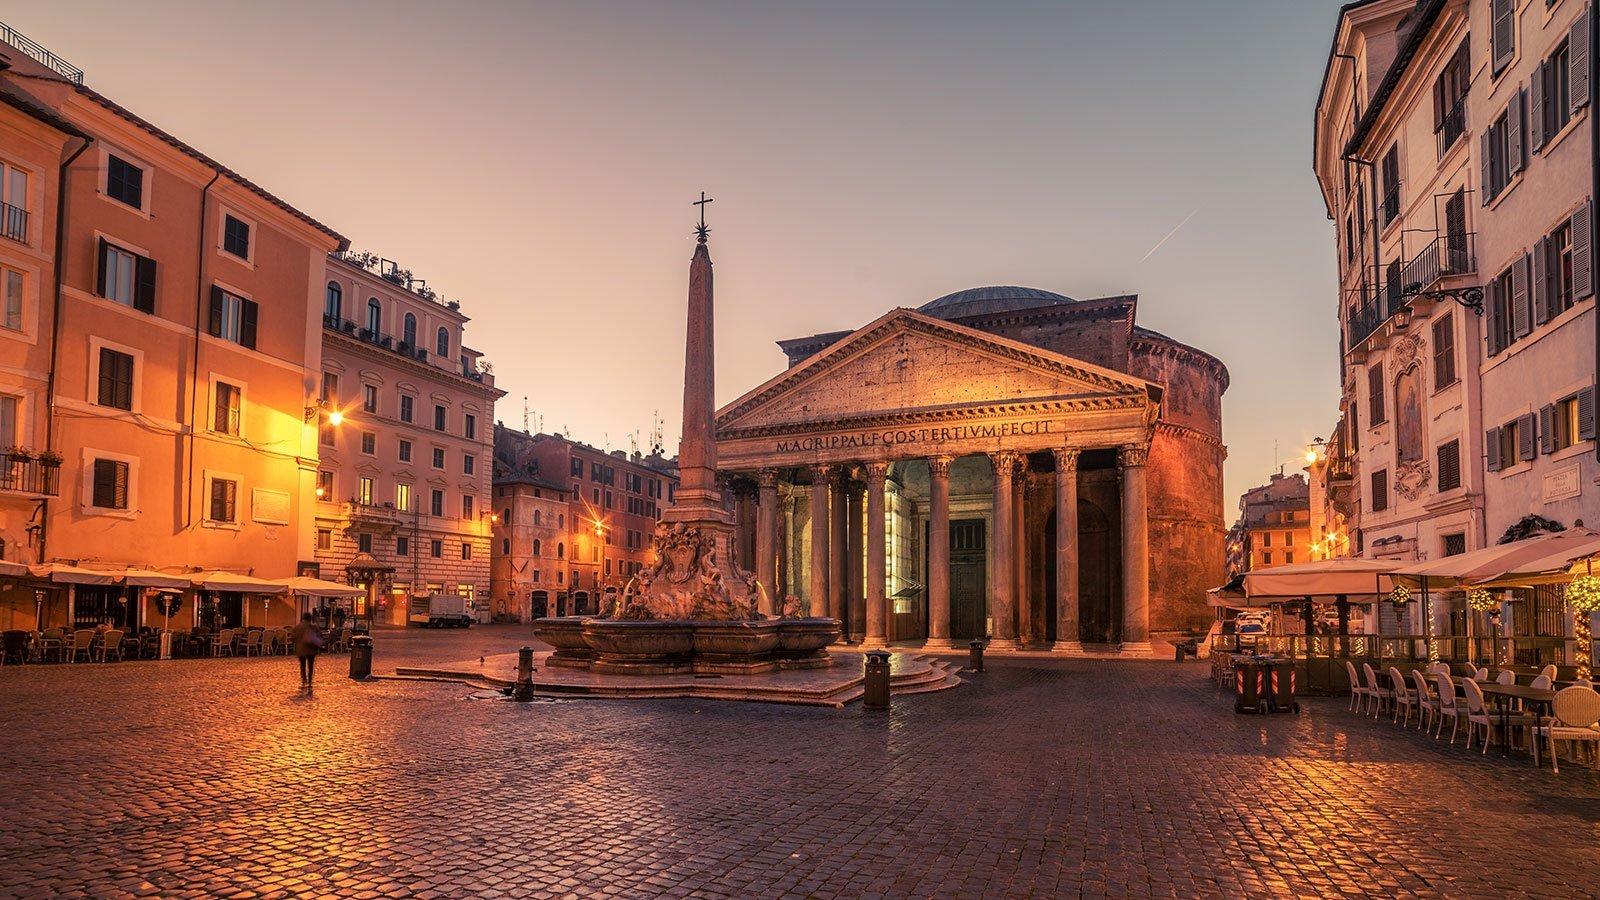 vista del Pantheon di Roma